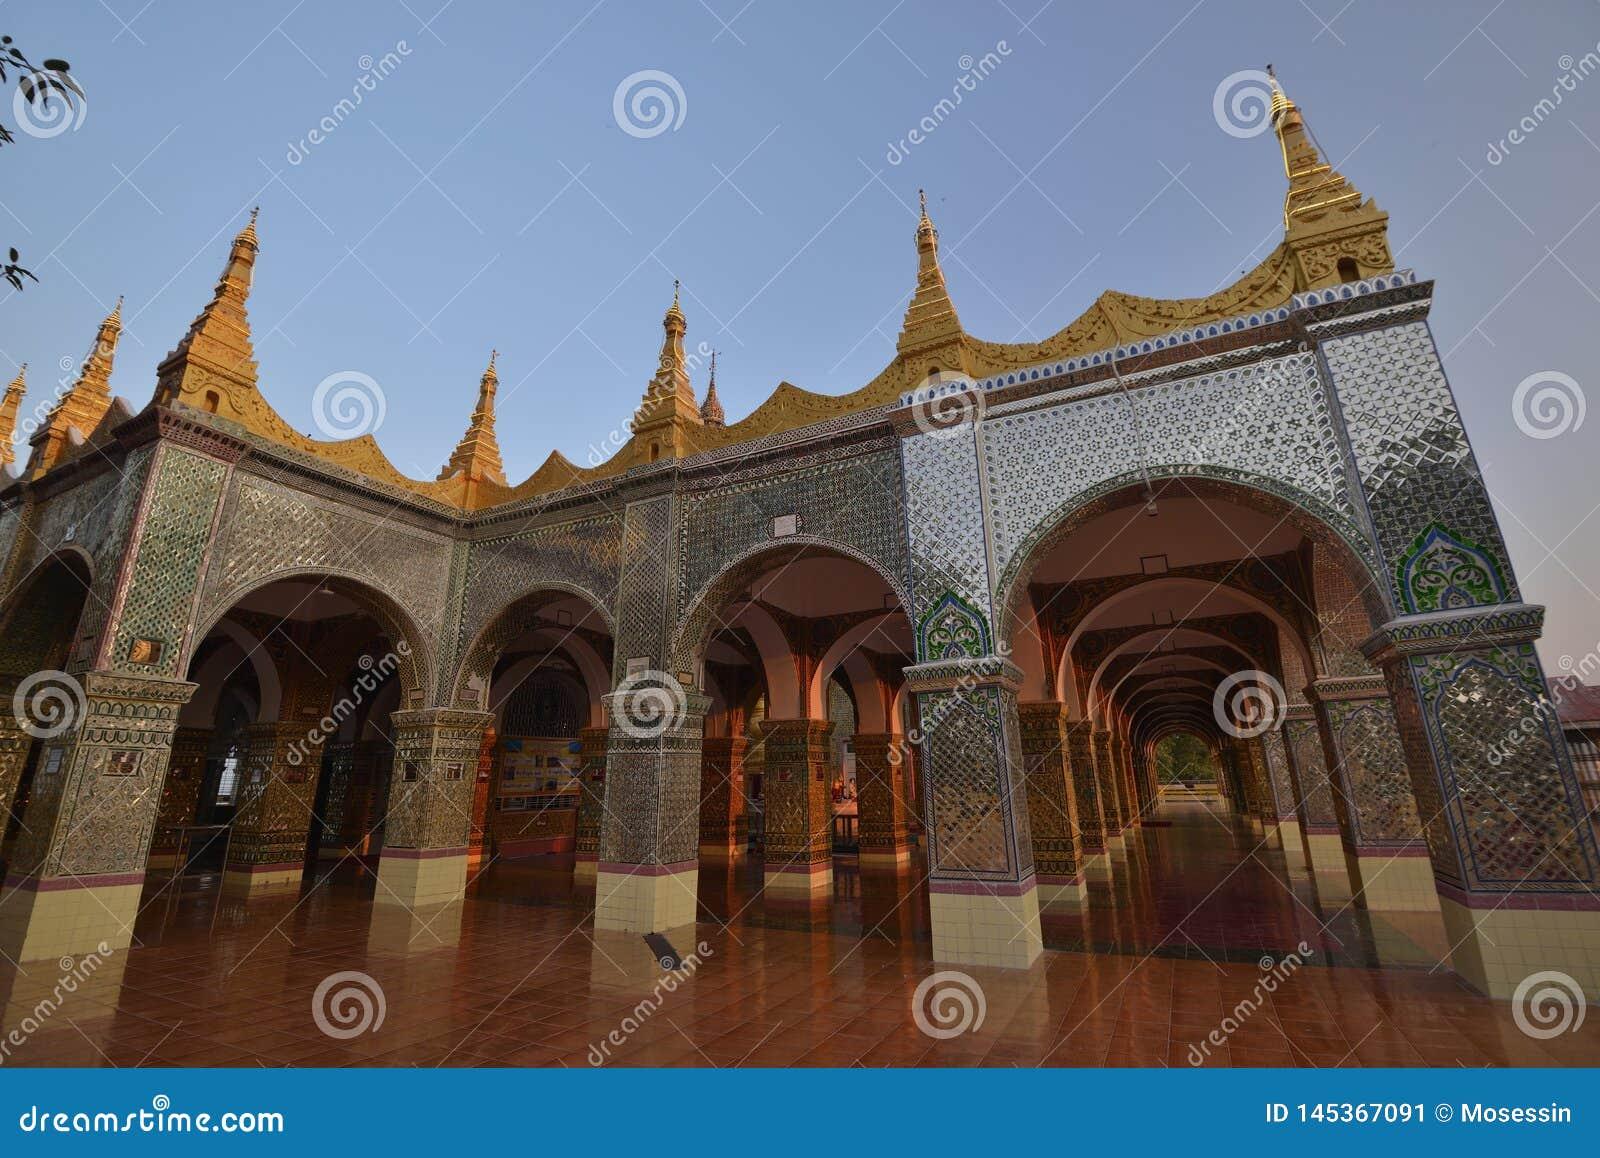 Mandalay Sutaungpye Pagoda